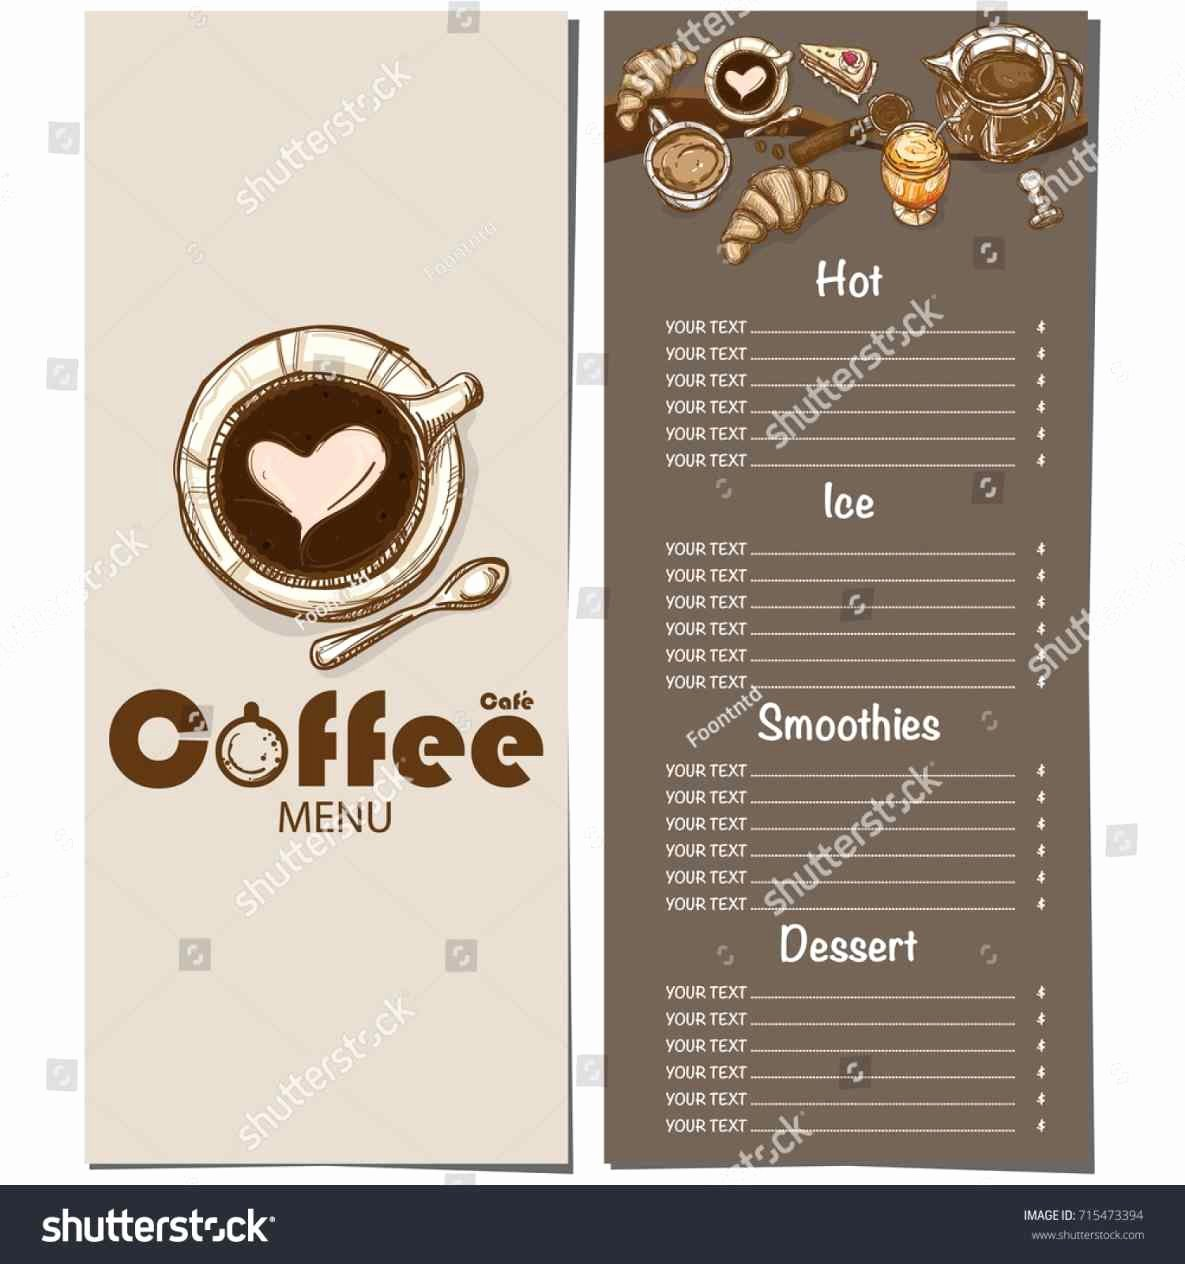 Coffee Shop Menu Template Inspirational the Collection Of Flyer Coffee Shop Menu Templates